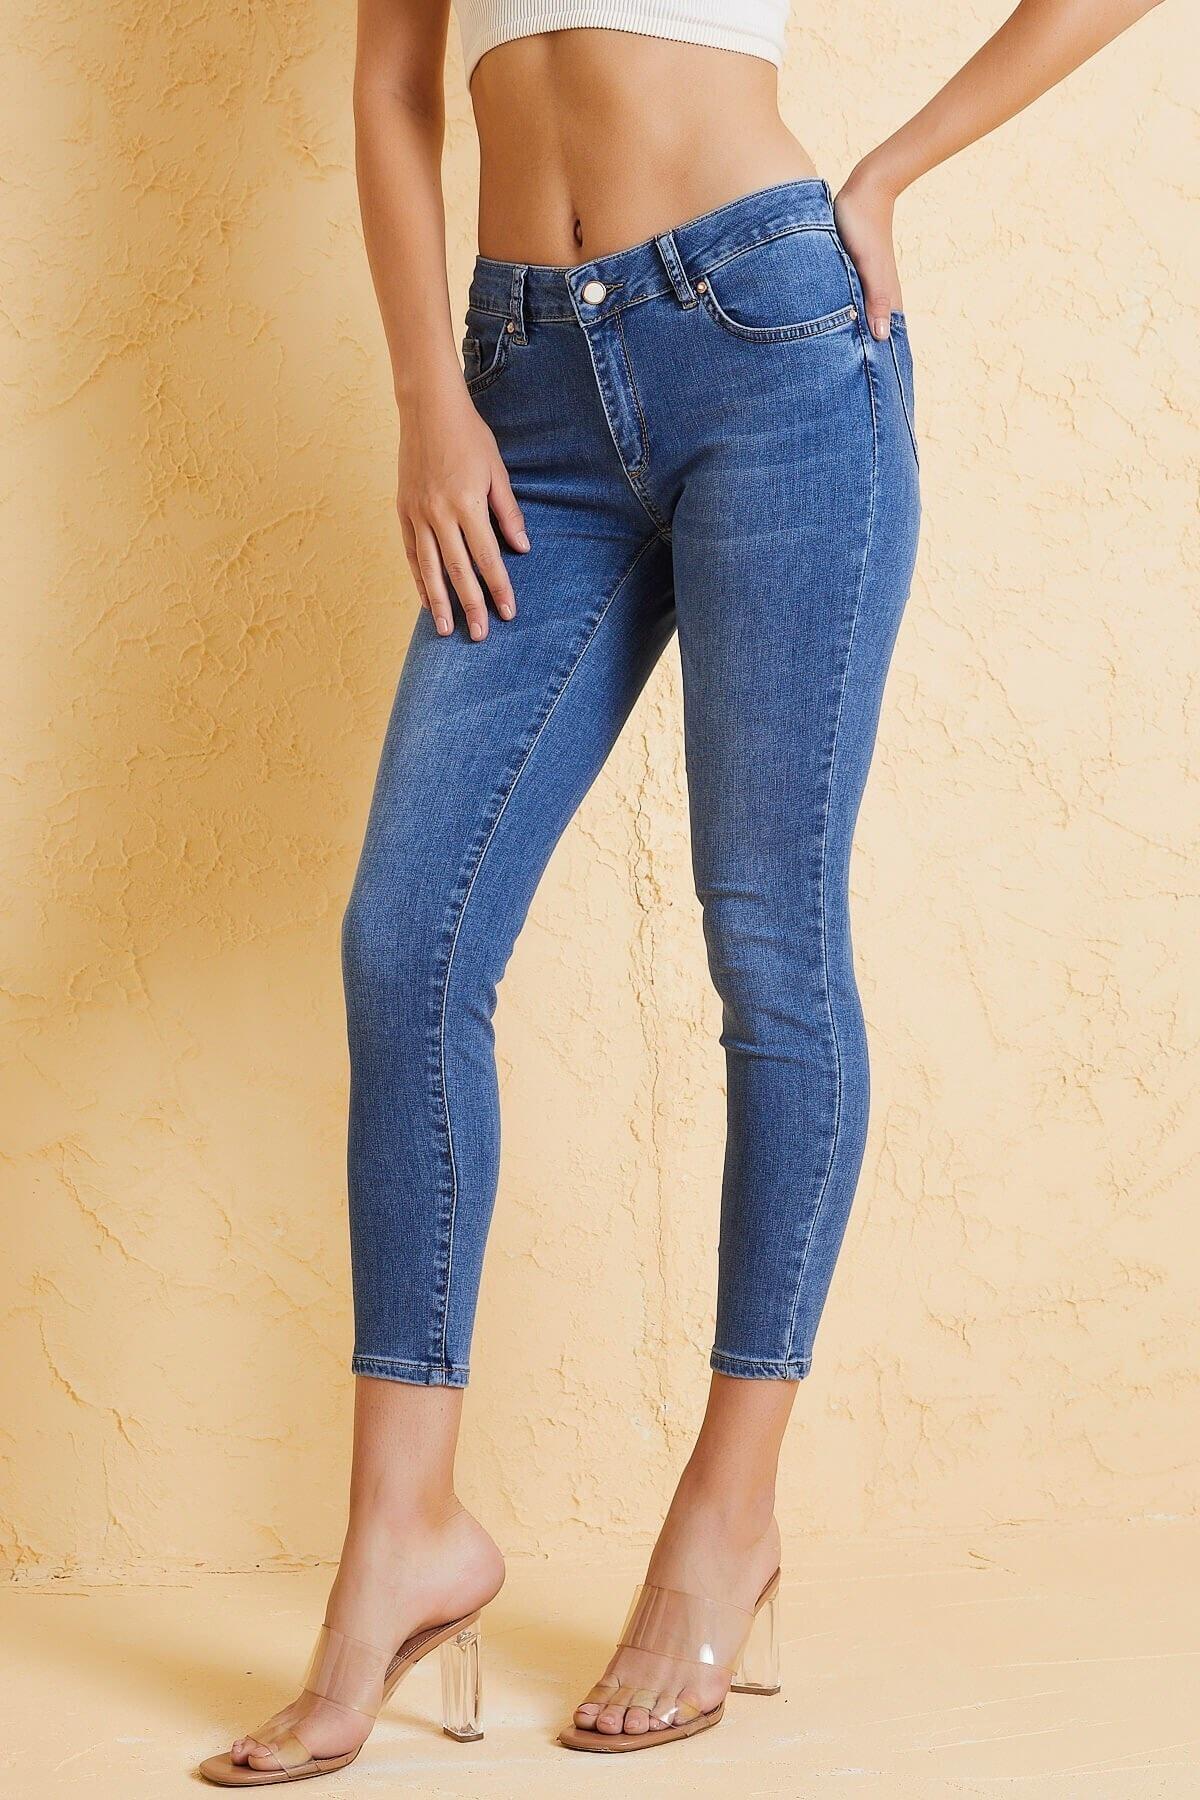 Twister Jeans Kadın Slim Fit Orta Bel Pantolon Lıma 9046-79 Mavı 2